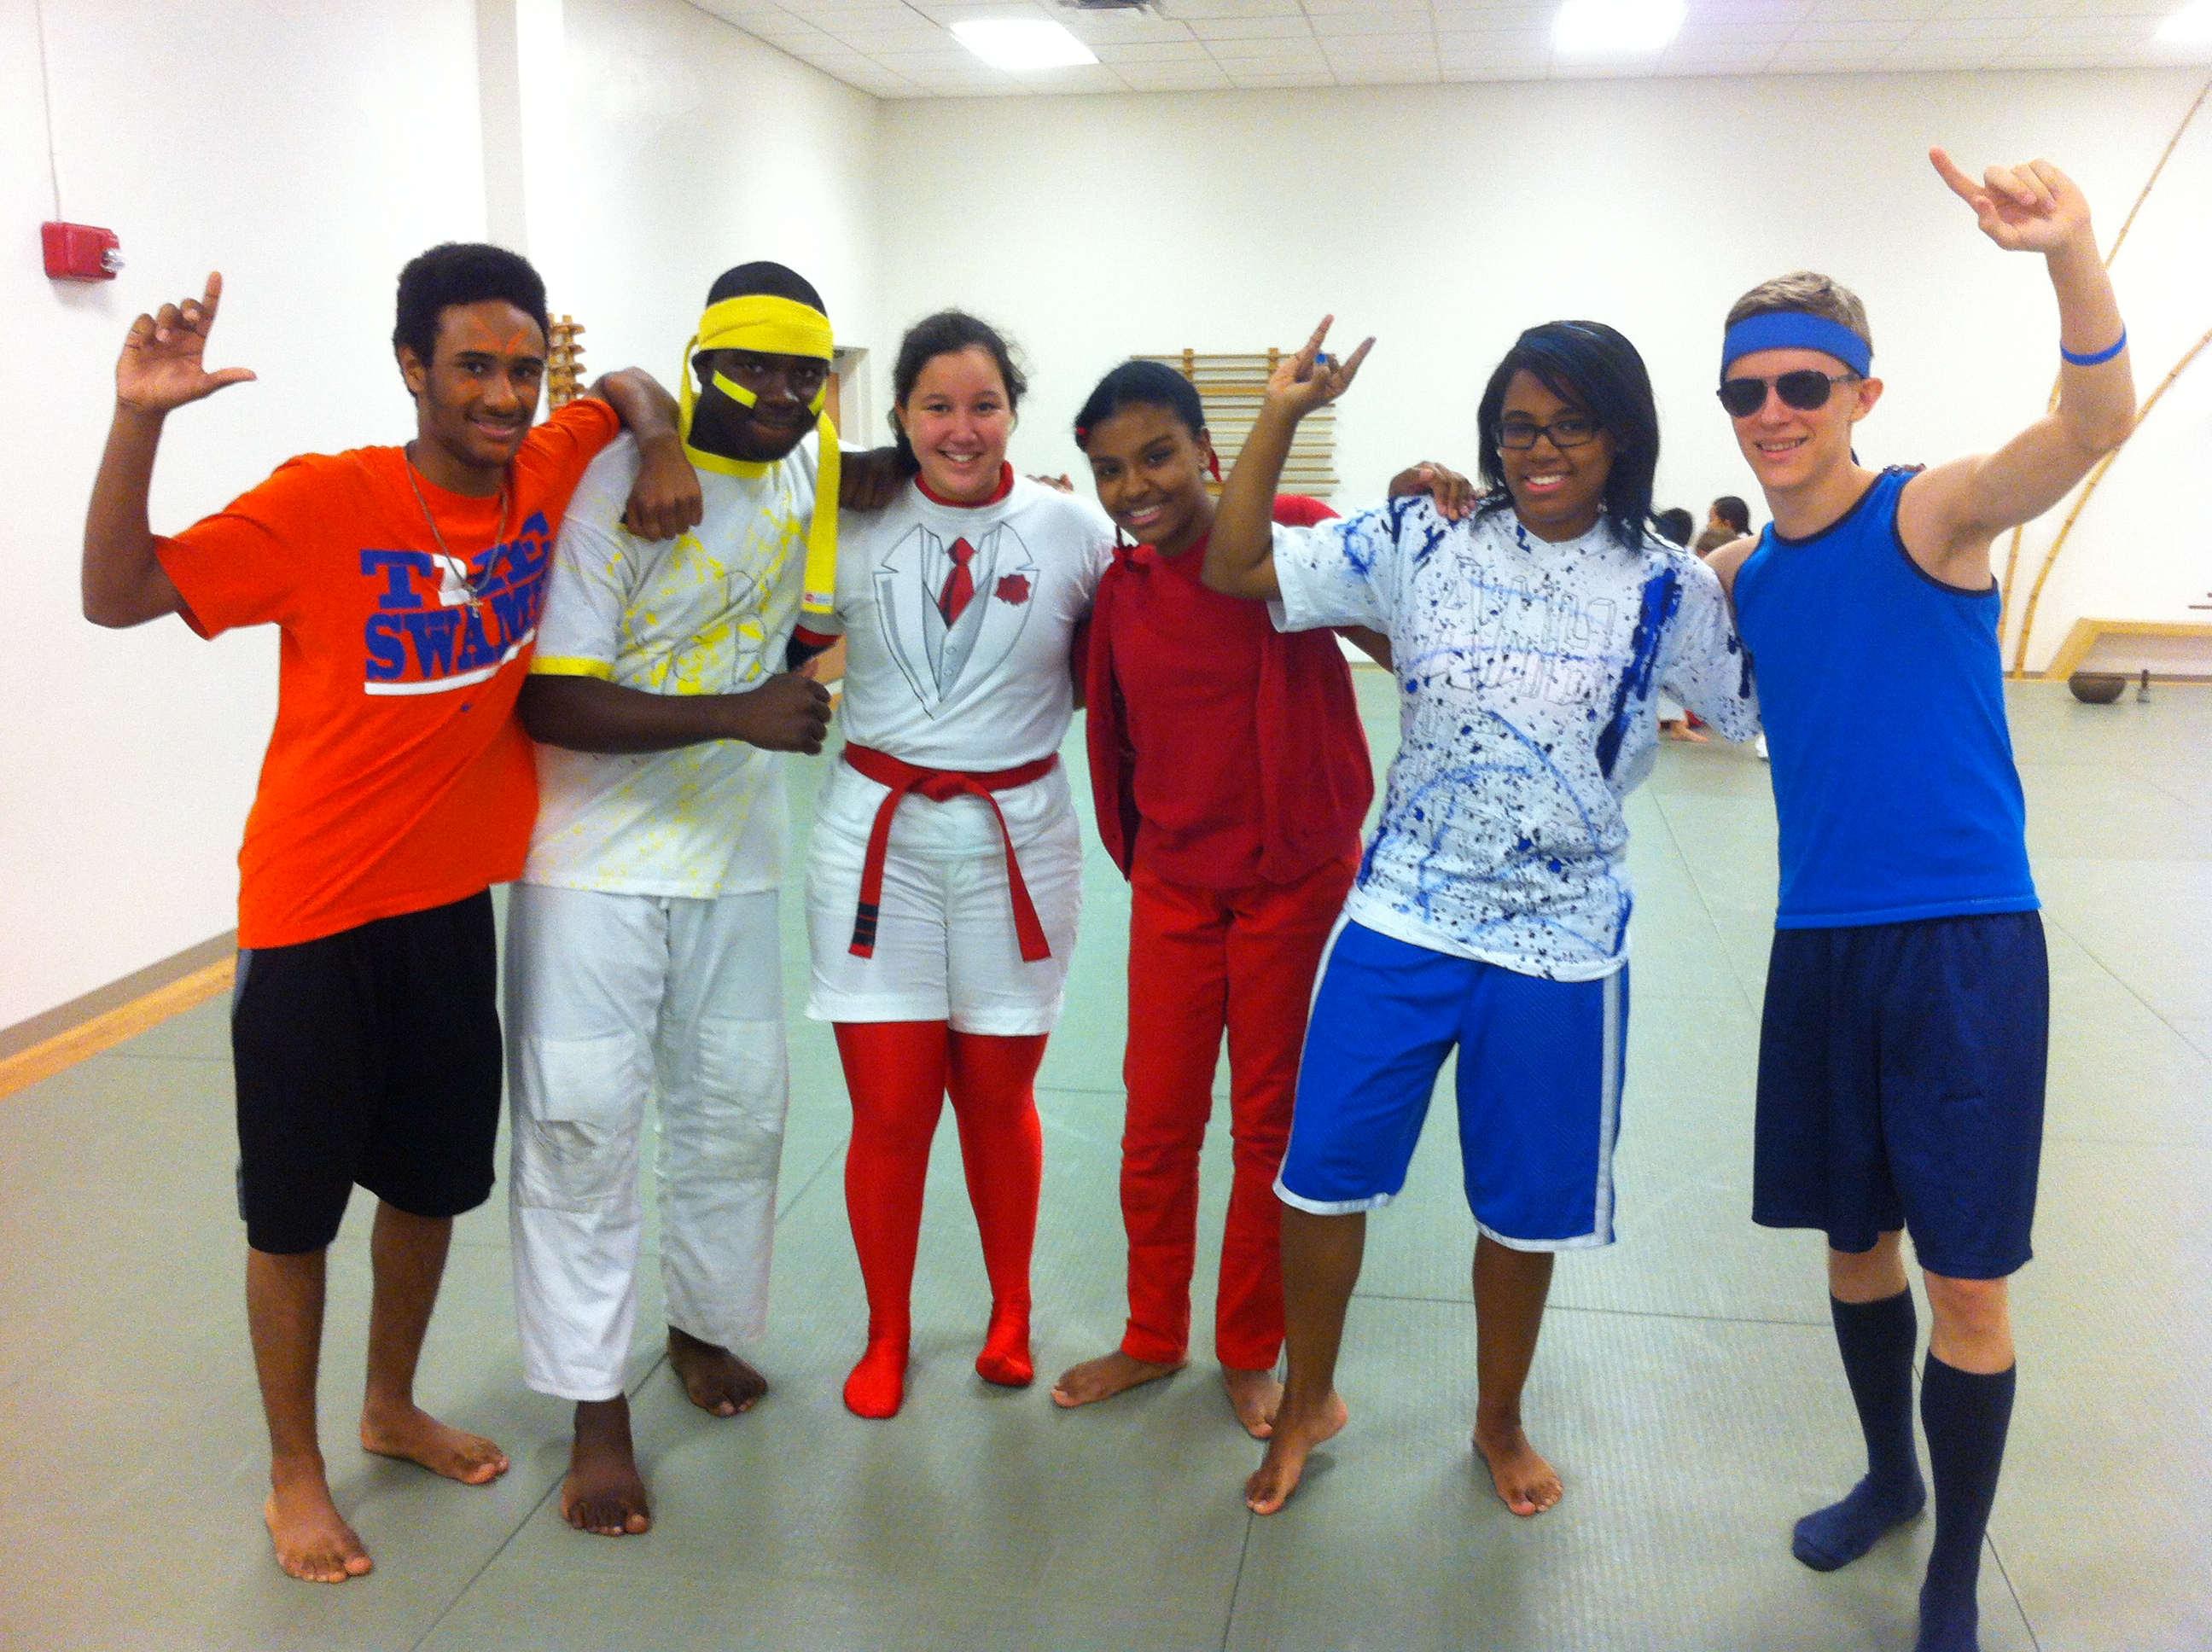 Summer Program - Martial Arts | Florida Aikikai: Aikido Camp